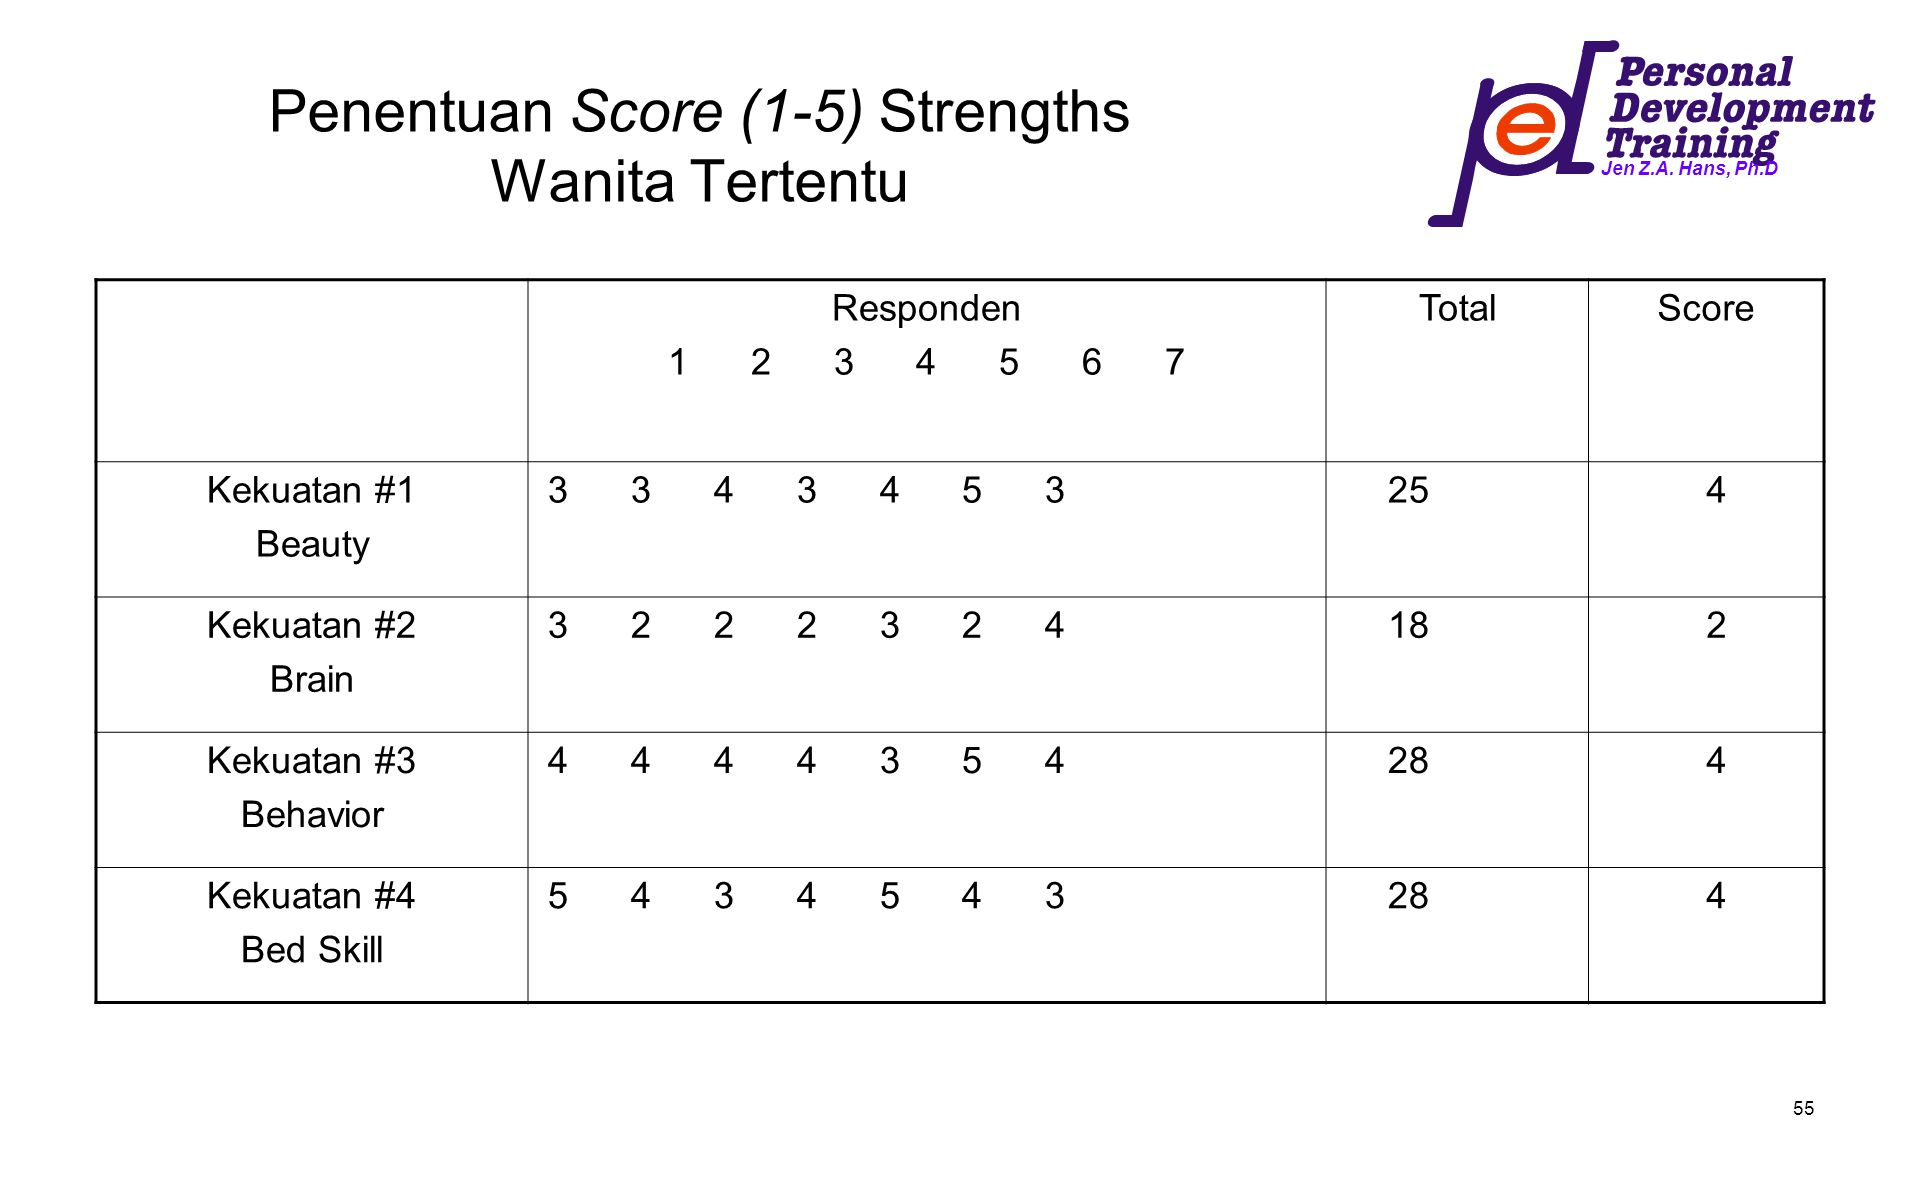 Penentuan Score (1-5) Strengths Wanita Tertentu